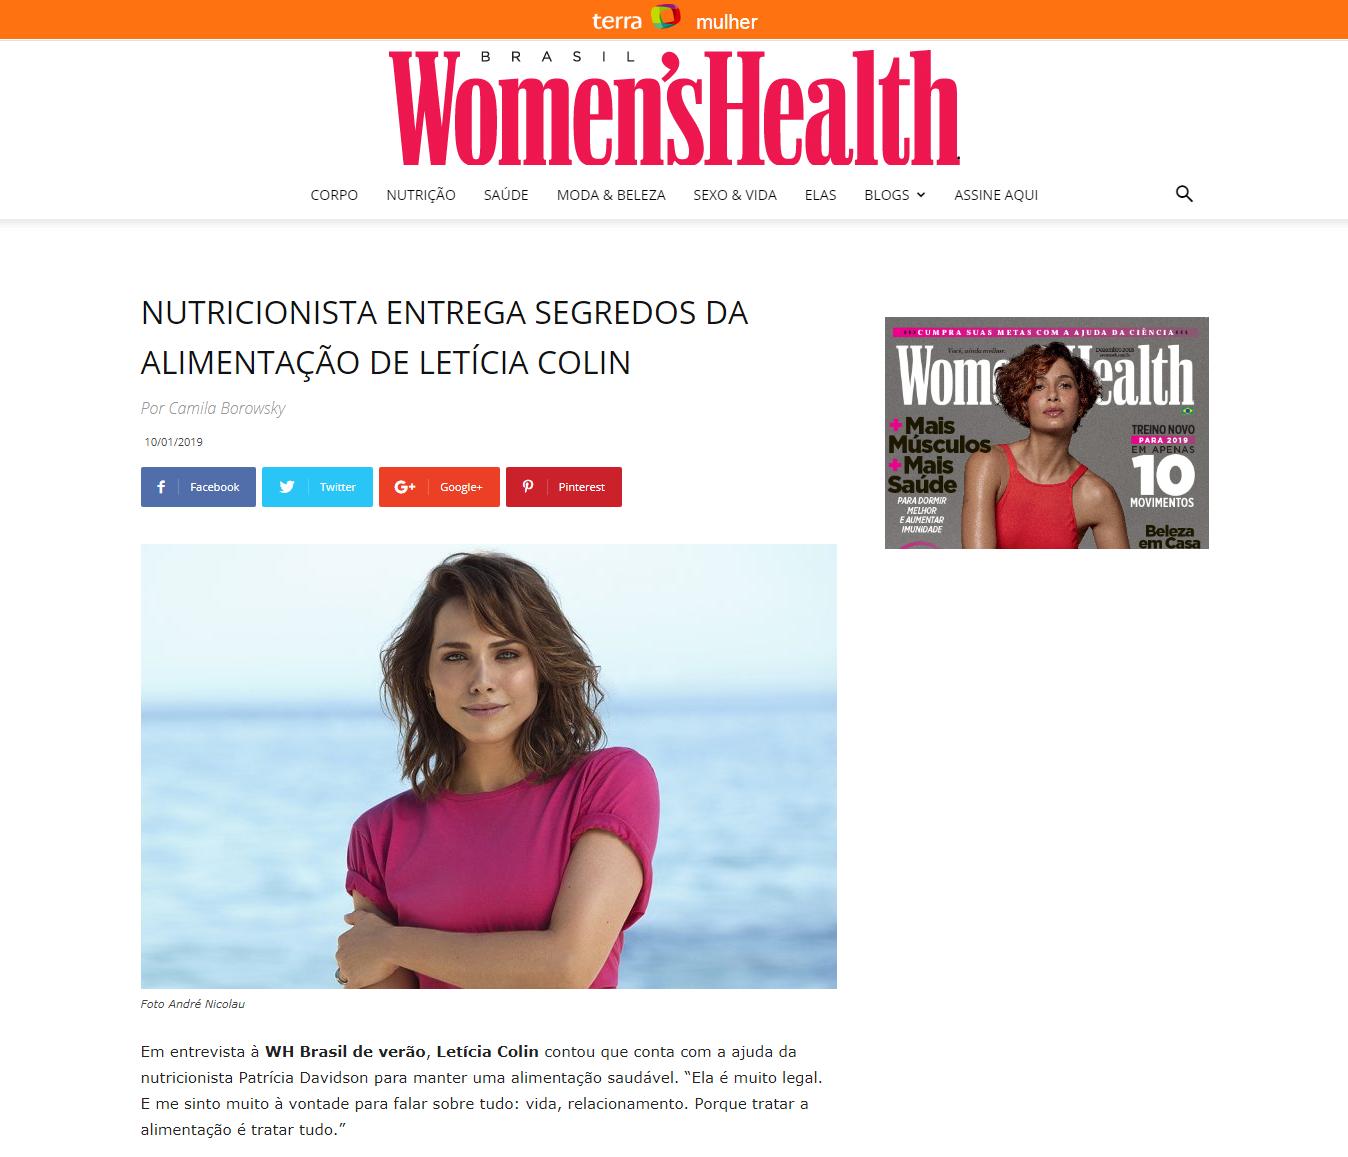 10-01-WOMEN-S_HEALTH_BRASIL-NOTICIAS-14178171